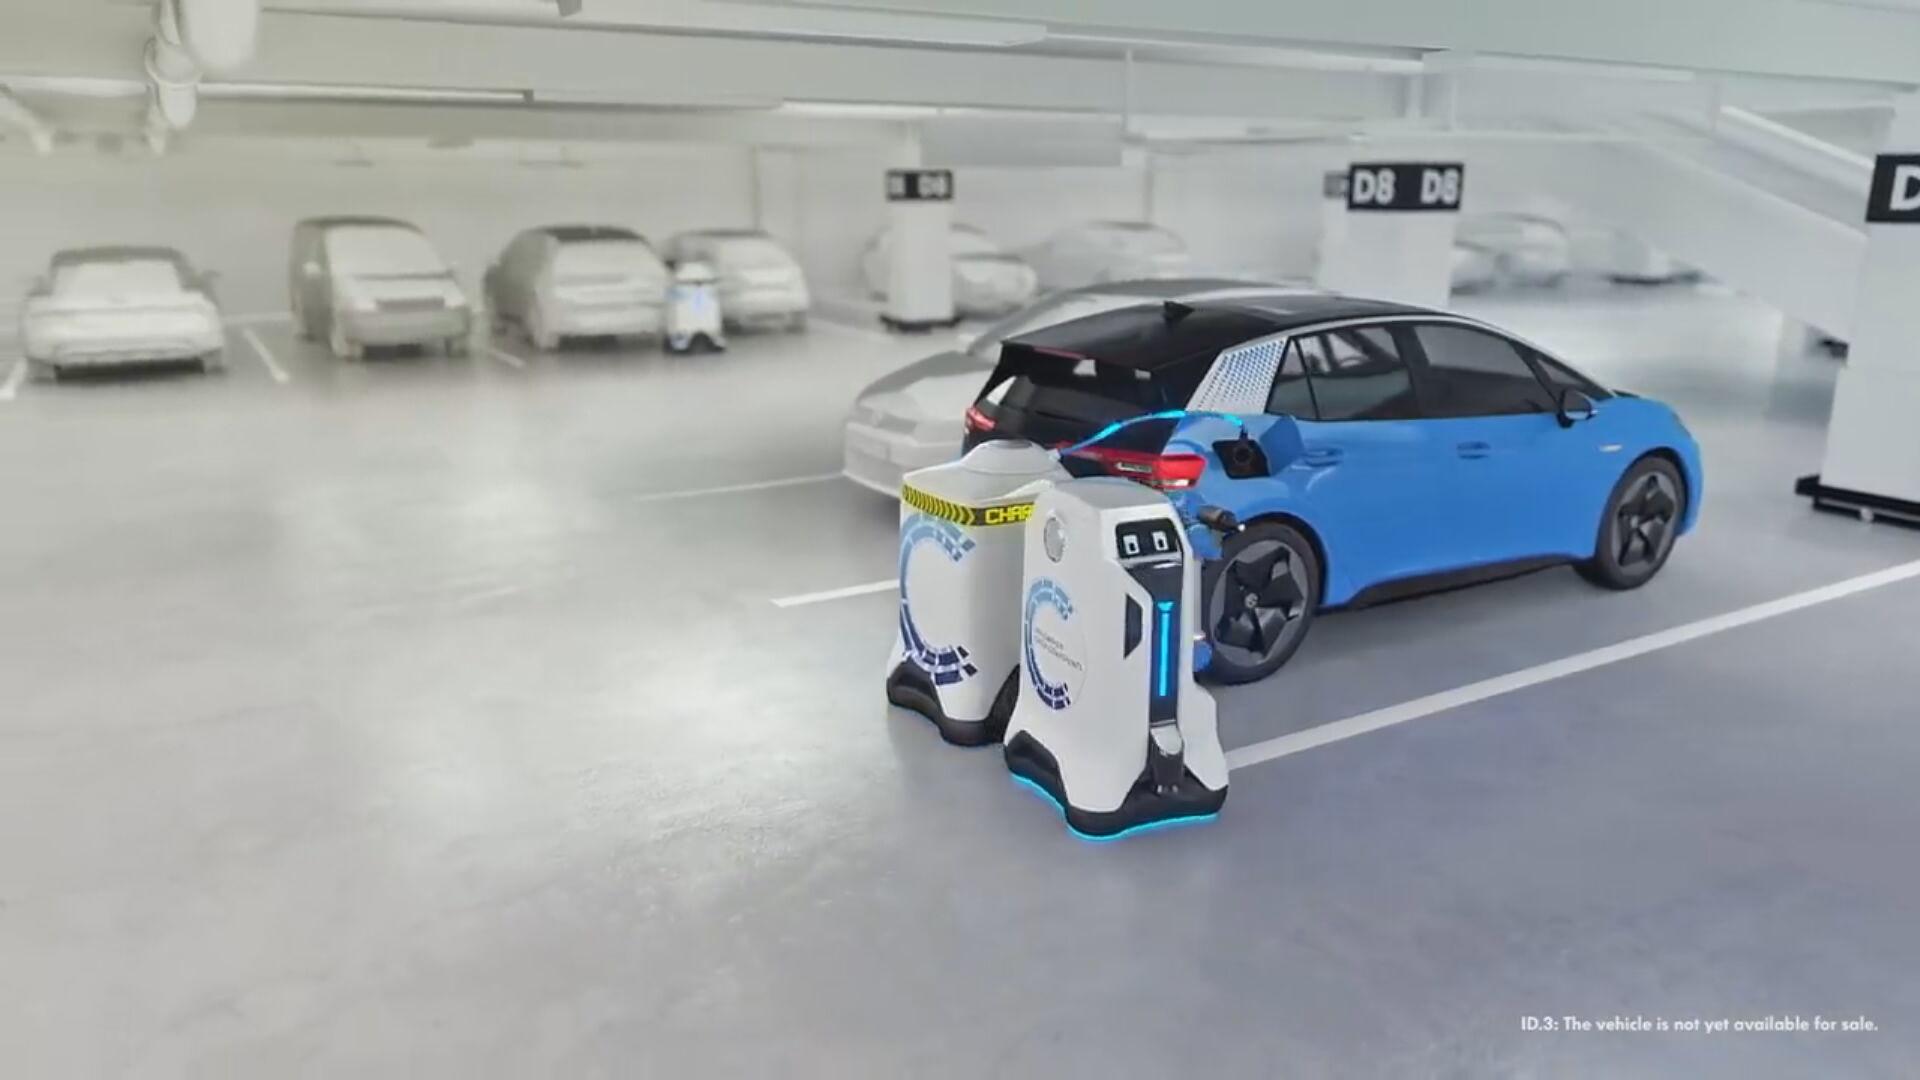 Volkswagen cria 'robô frentista' que recarrega carros elétricos